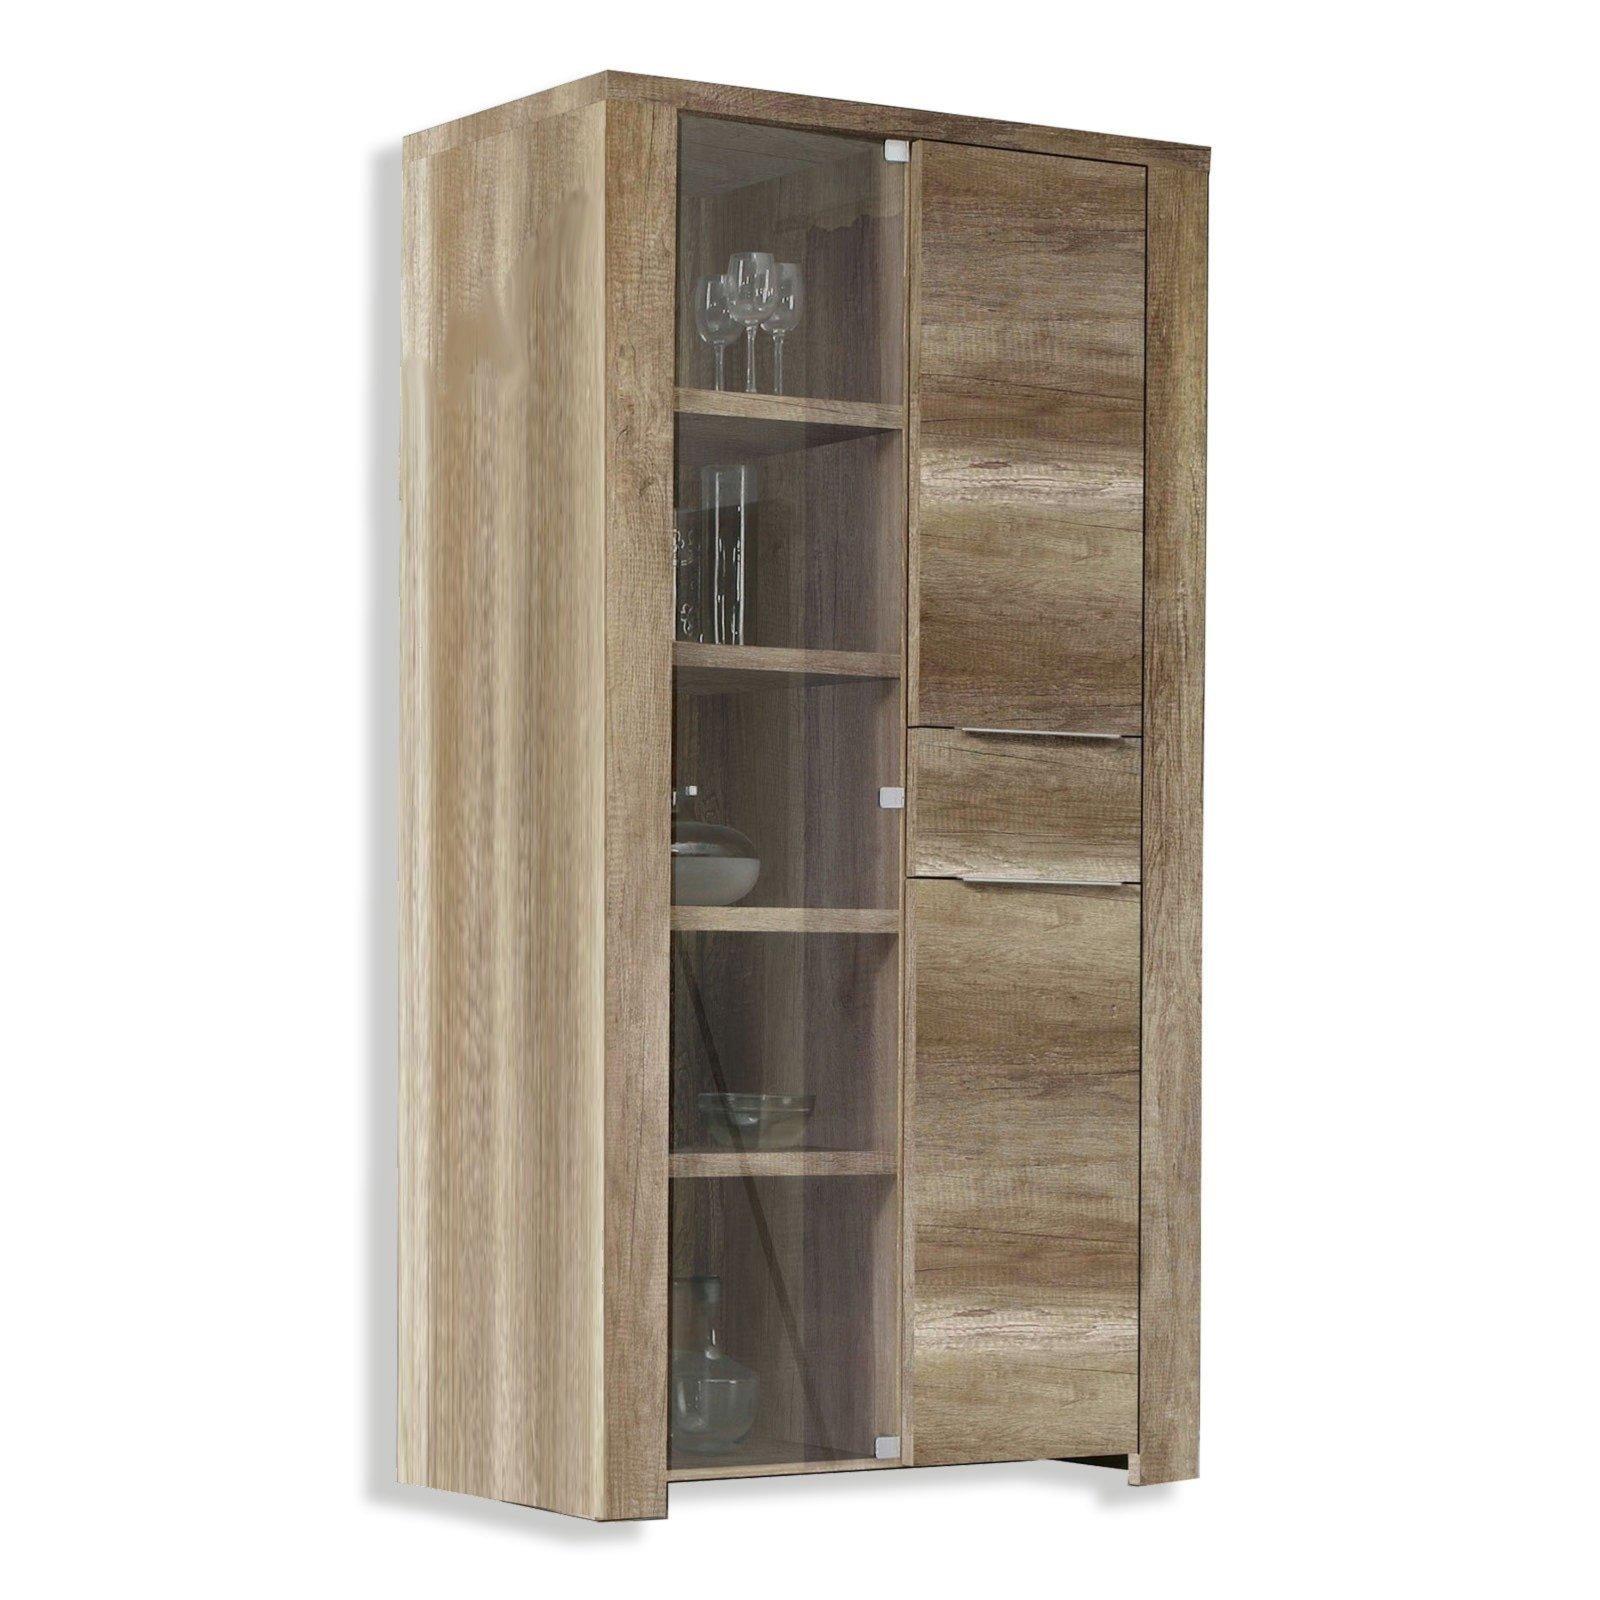 Ikea Online Katalog Badmobel Schranksysteme